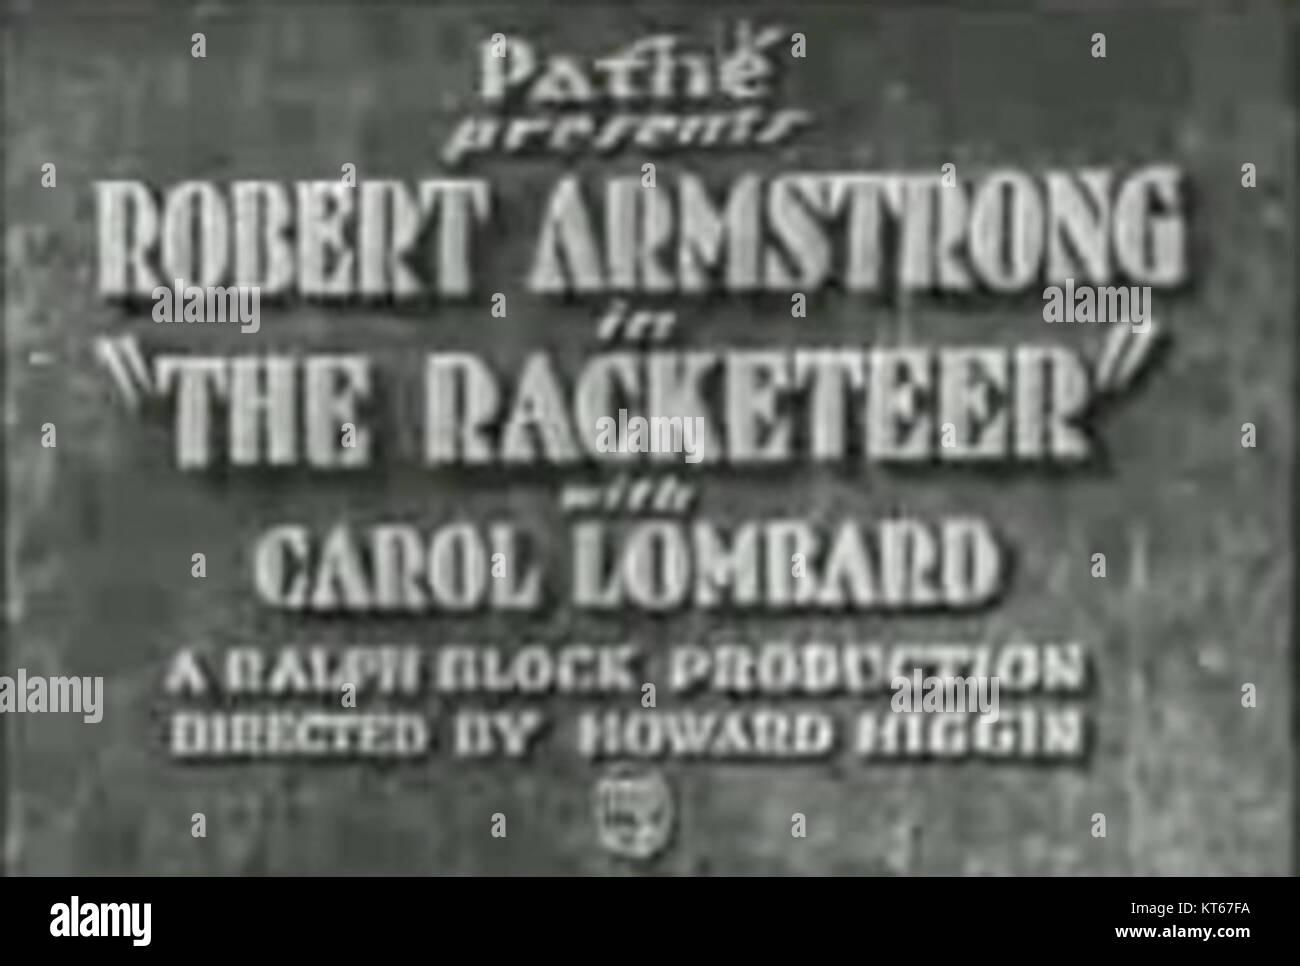 The Racketeer credits - Stock Image